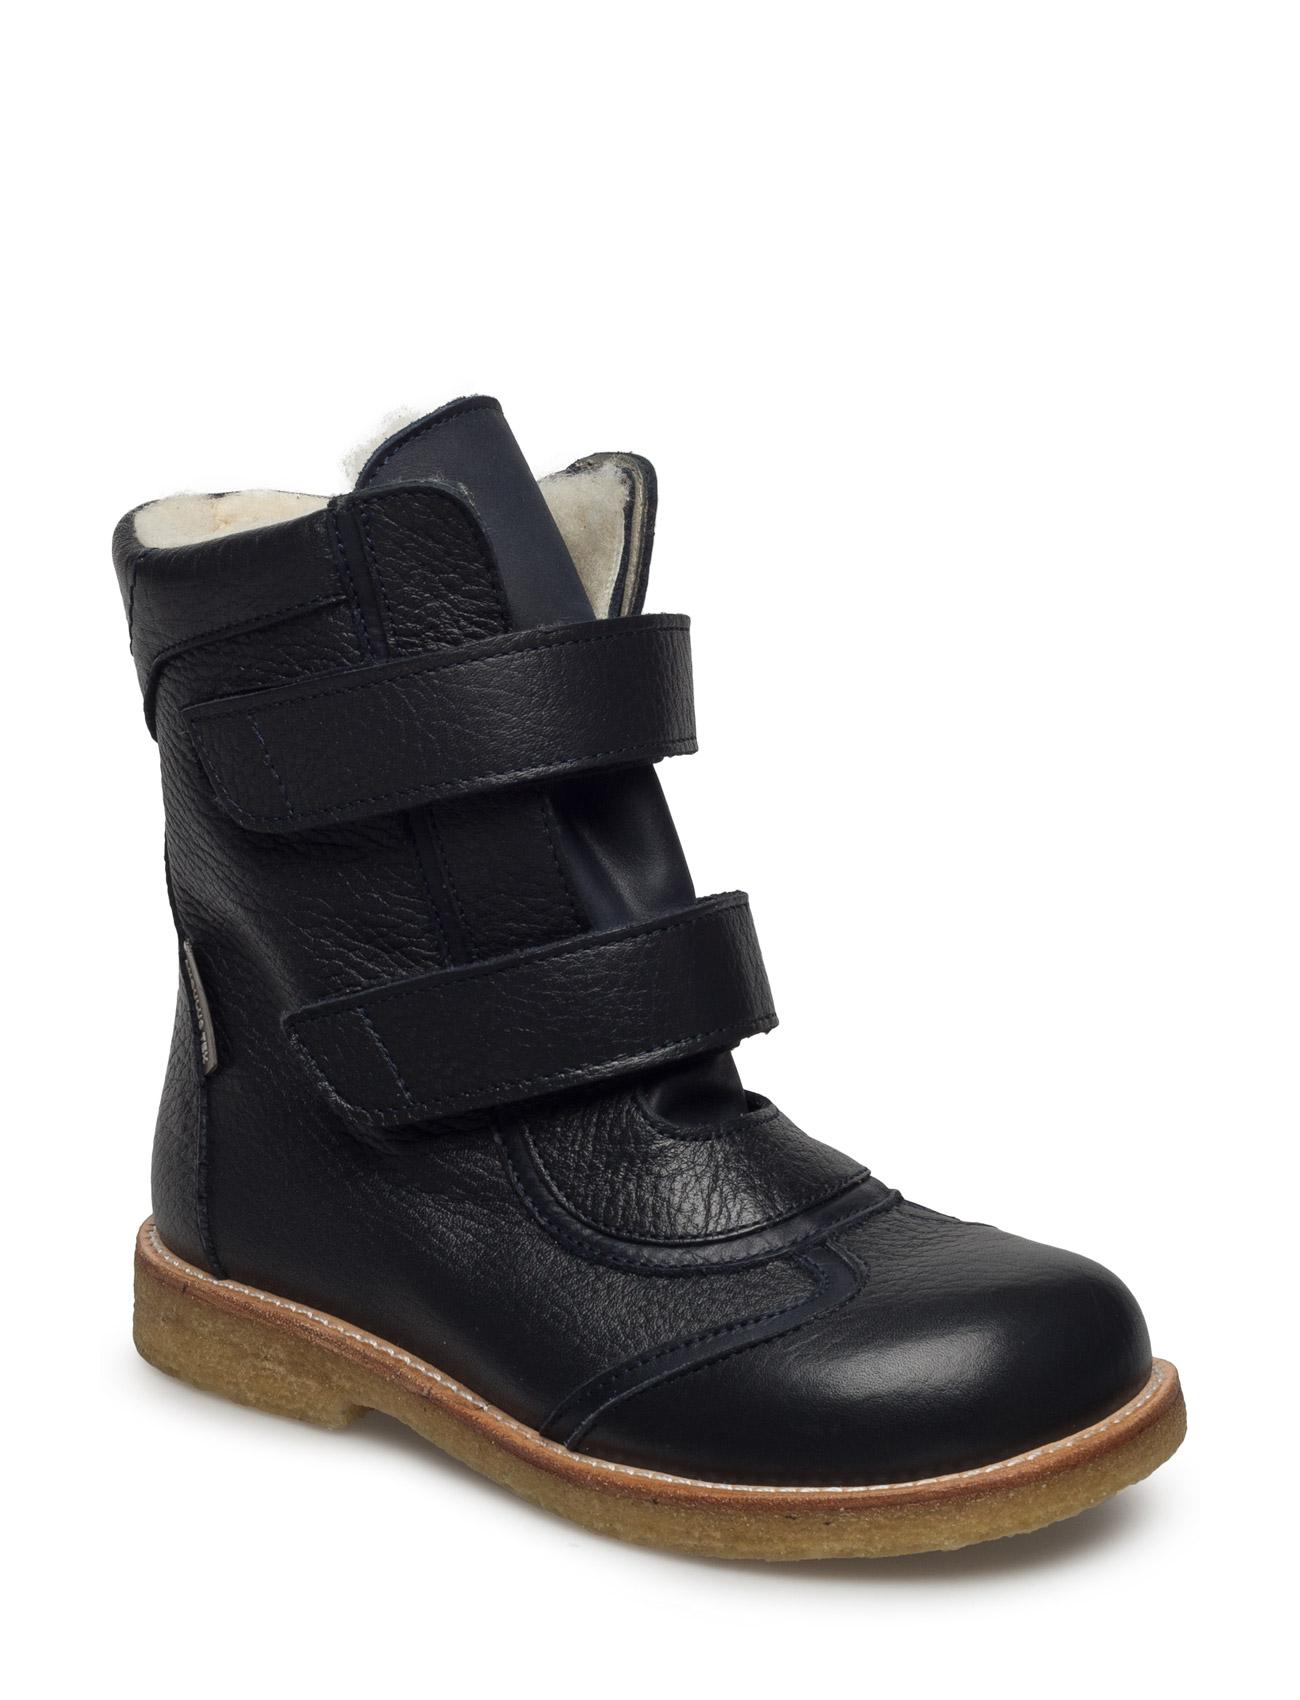 2302 ANGULUS Støvler til Børn i